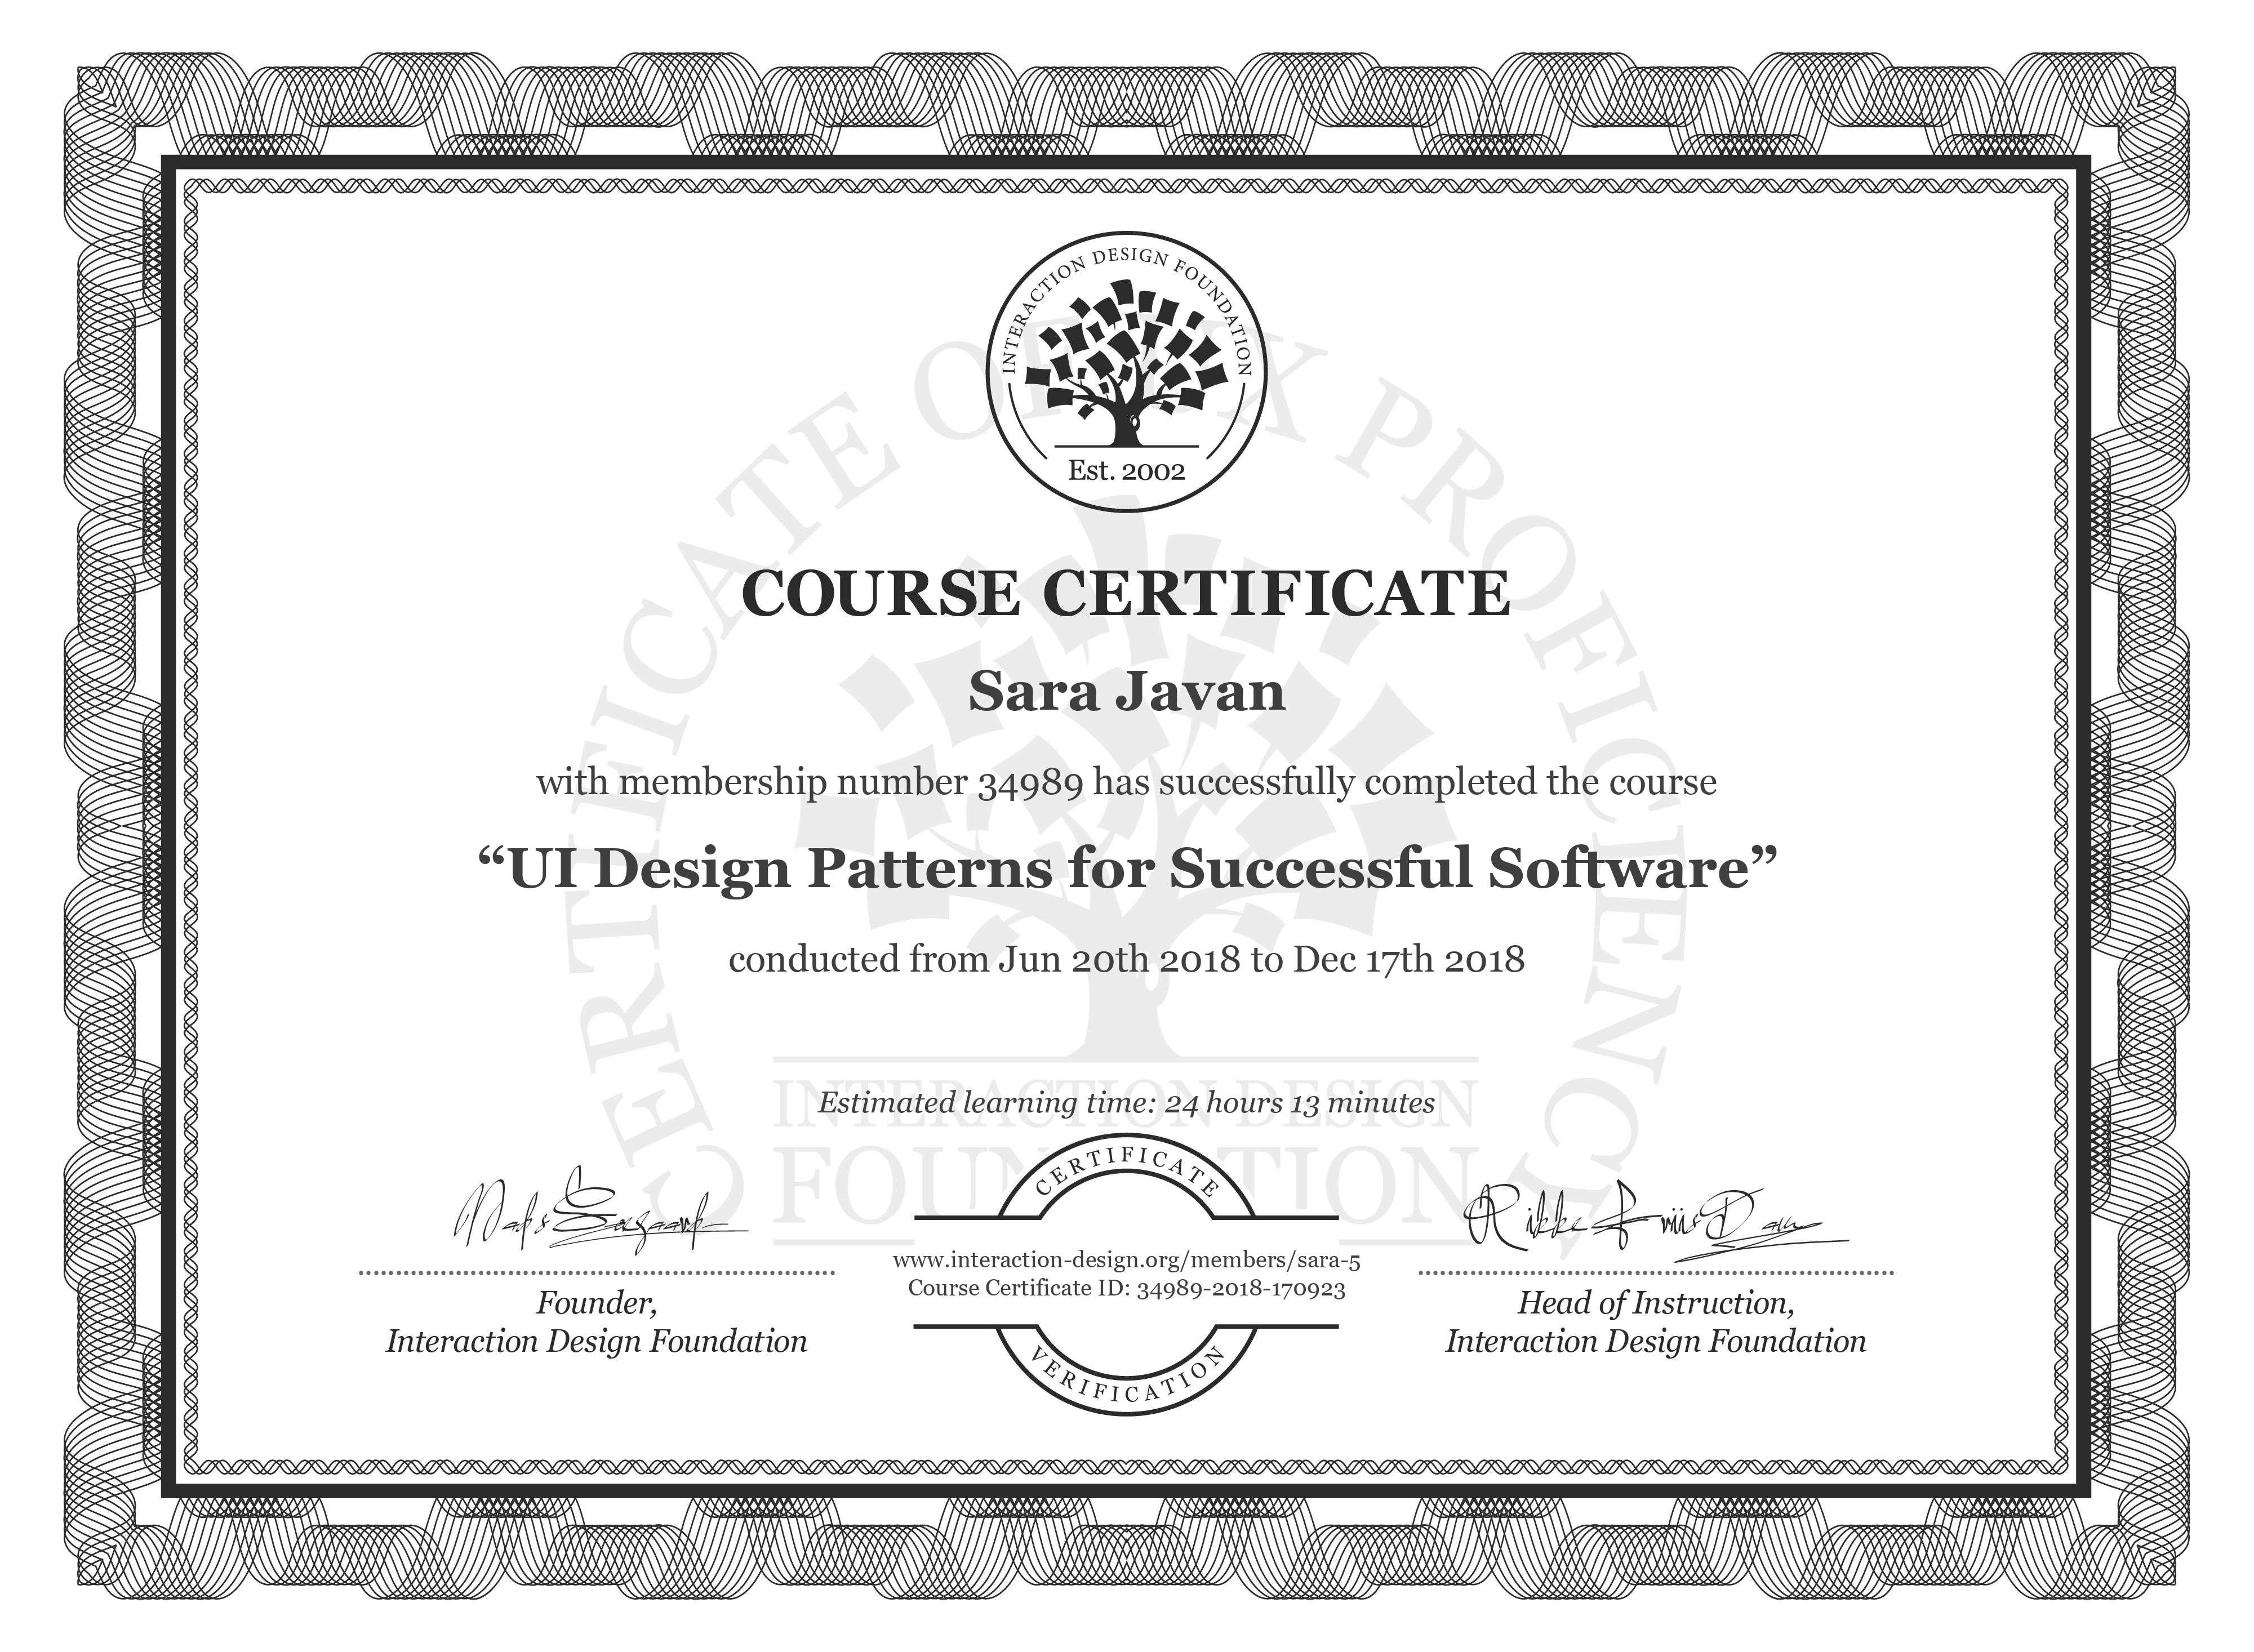 Sara Javan's Course Certificate: UI Design Patterns for Successful Software